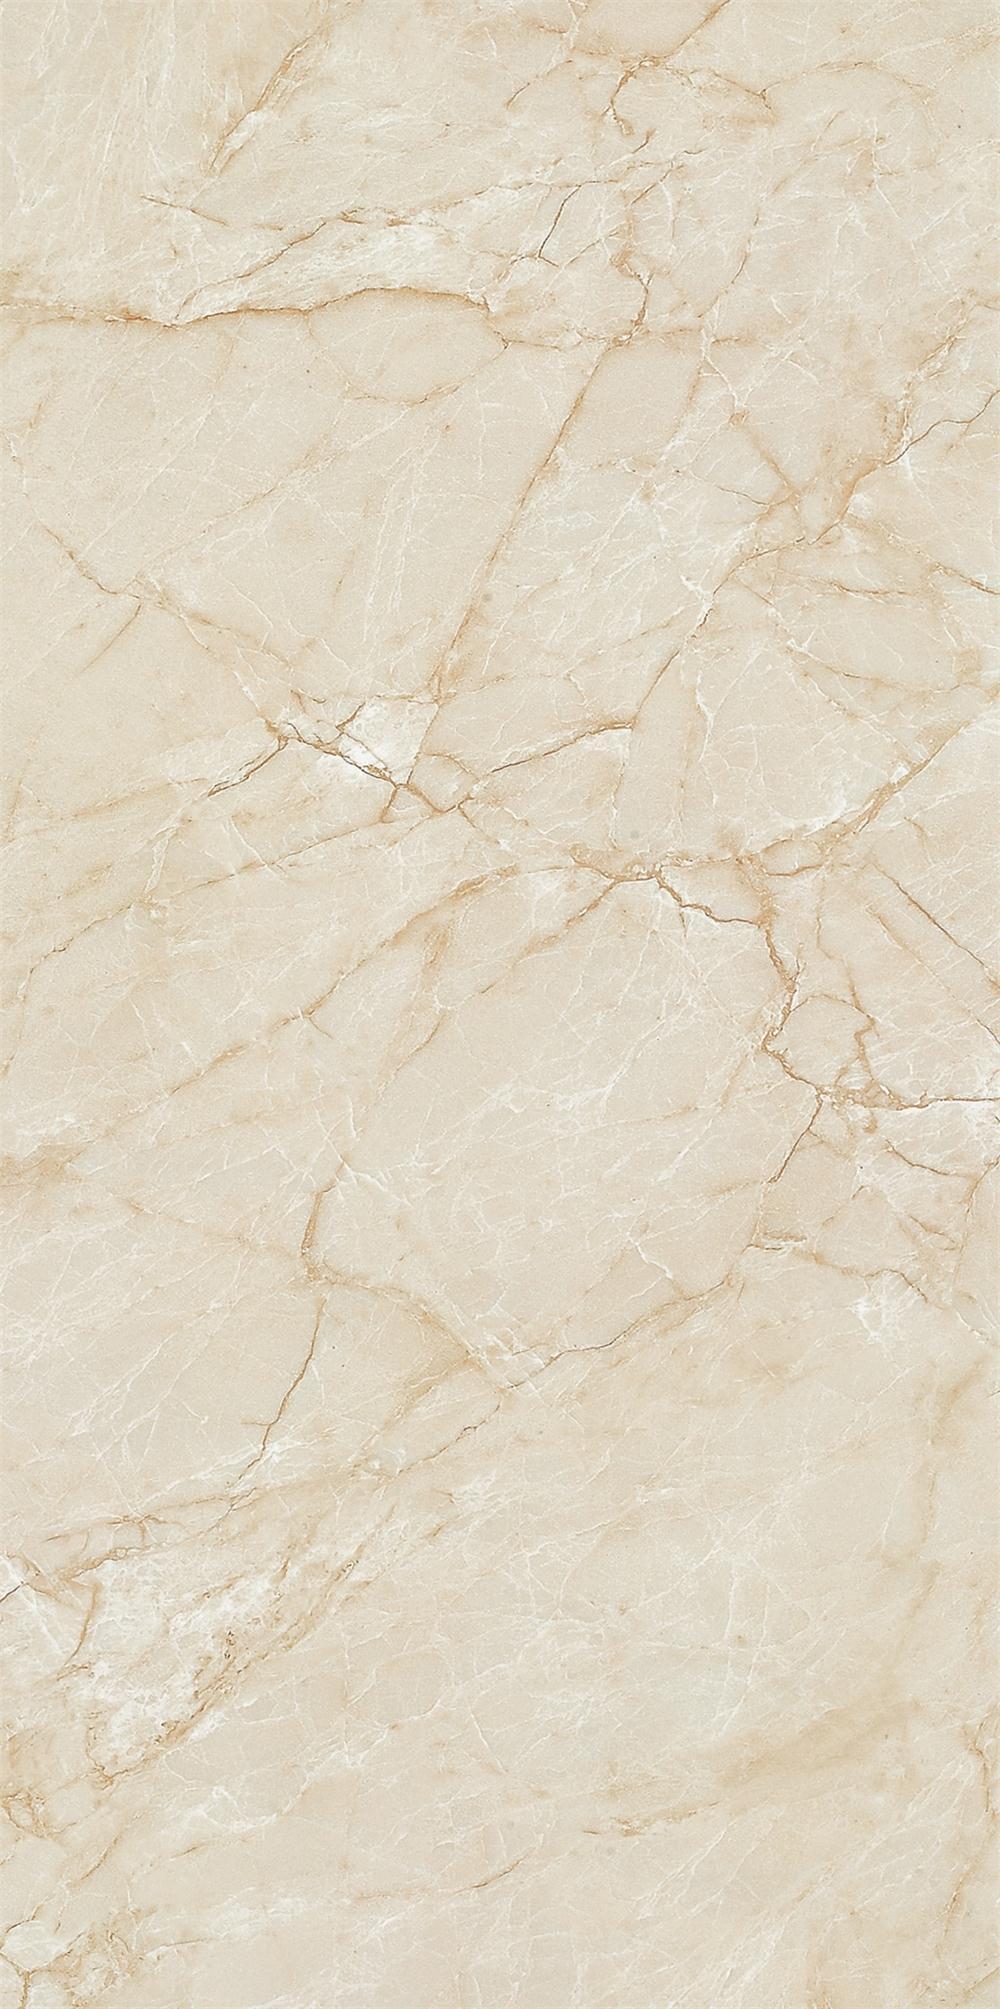 HPG26038裂纹石(1200mmX600mm)